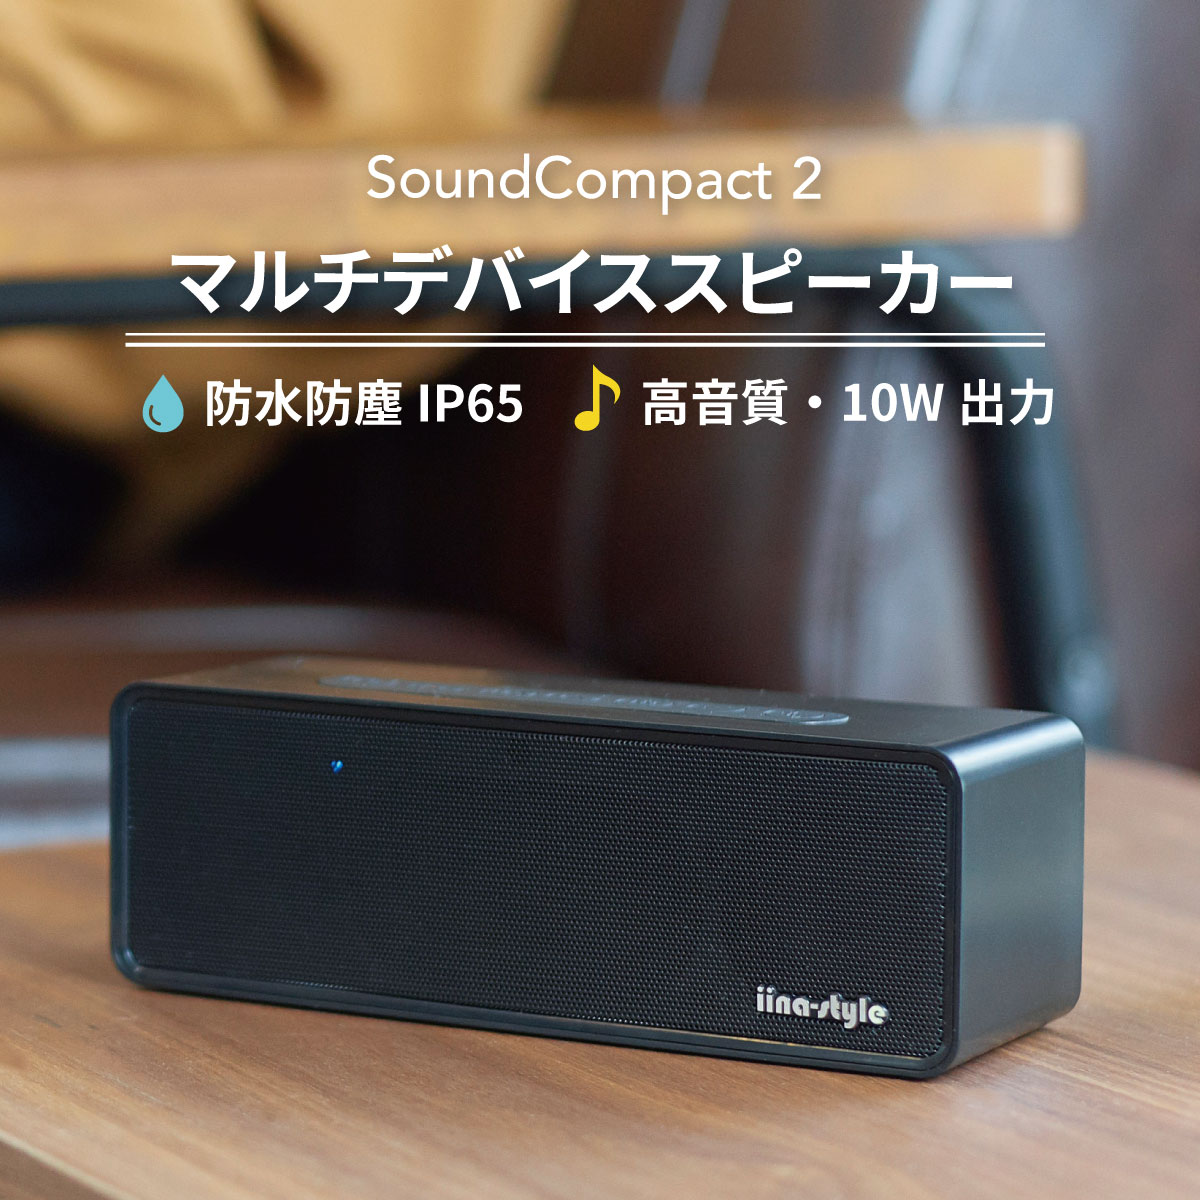 Bluetooth スピーカー SoundCompact 2